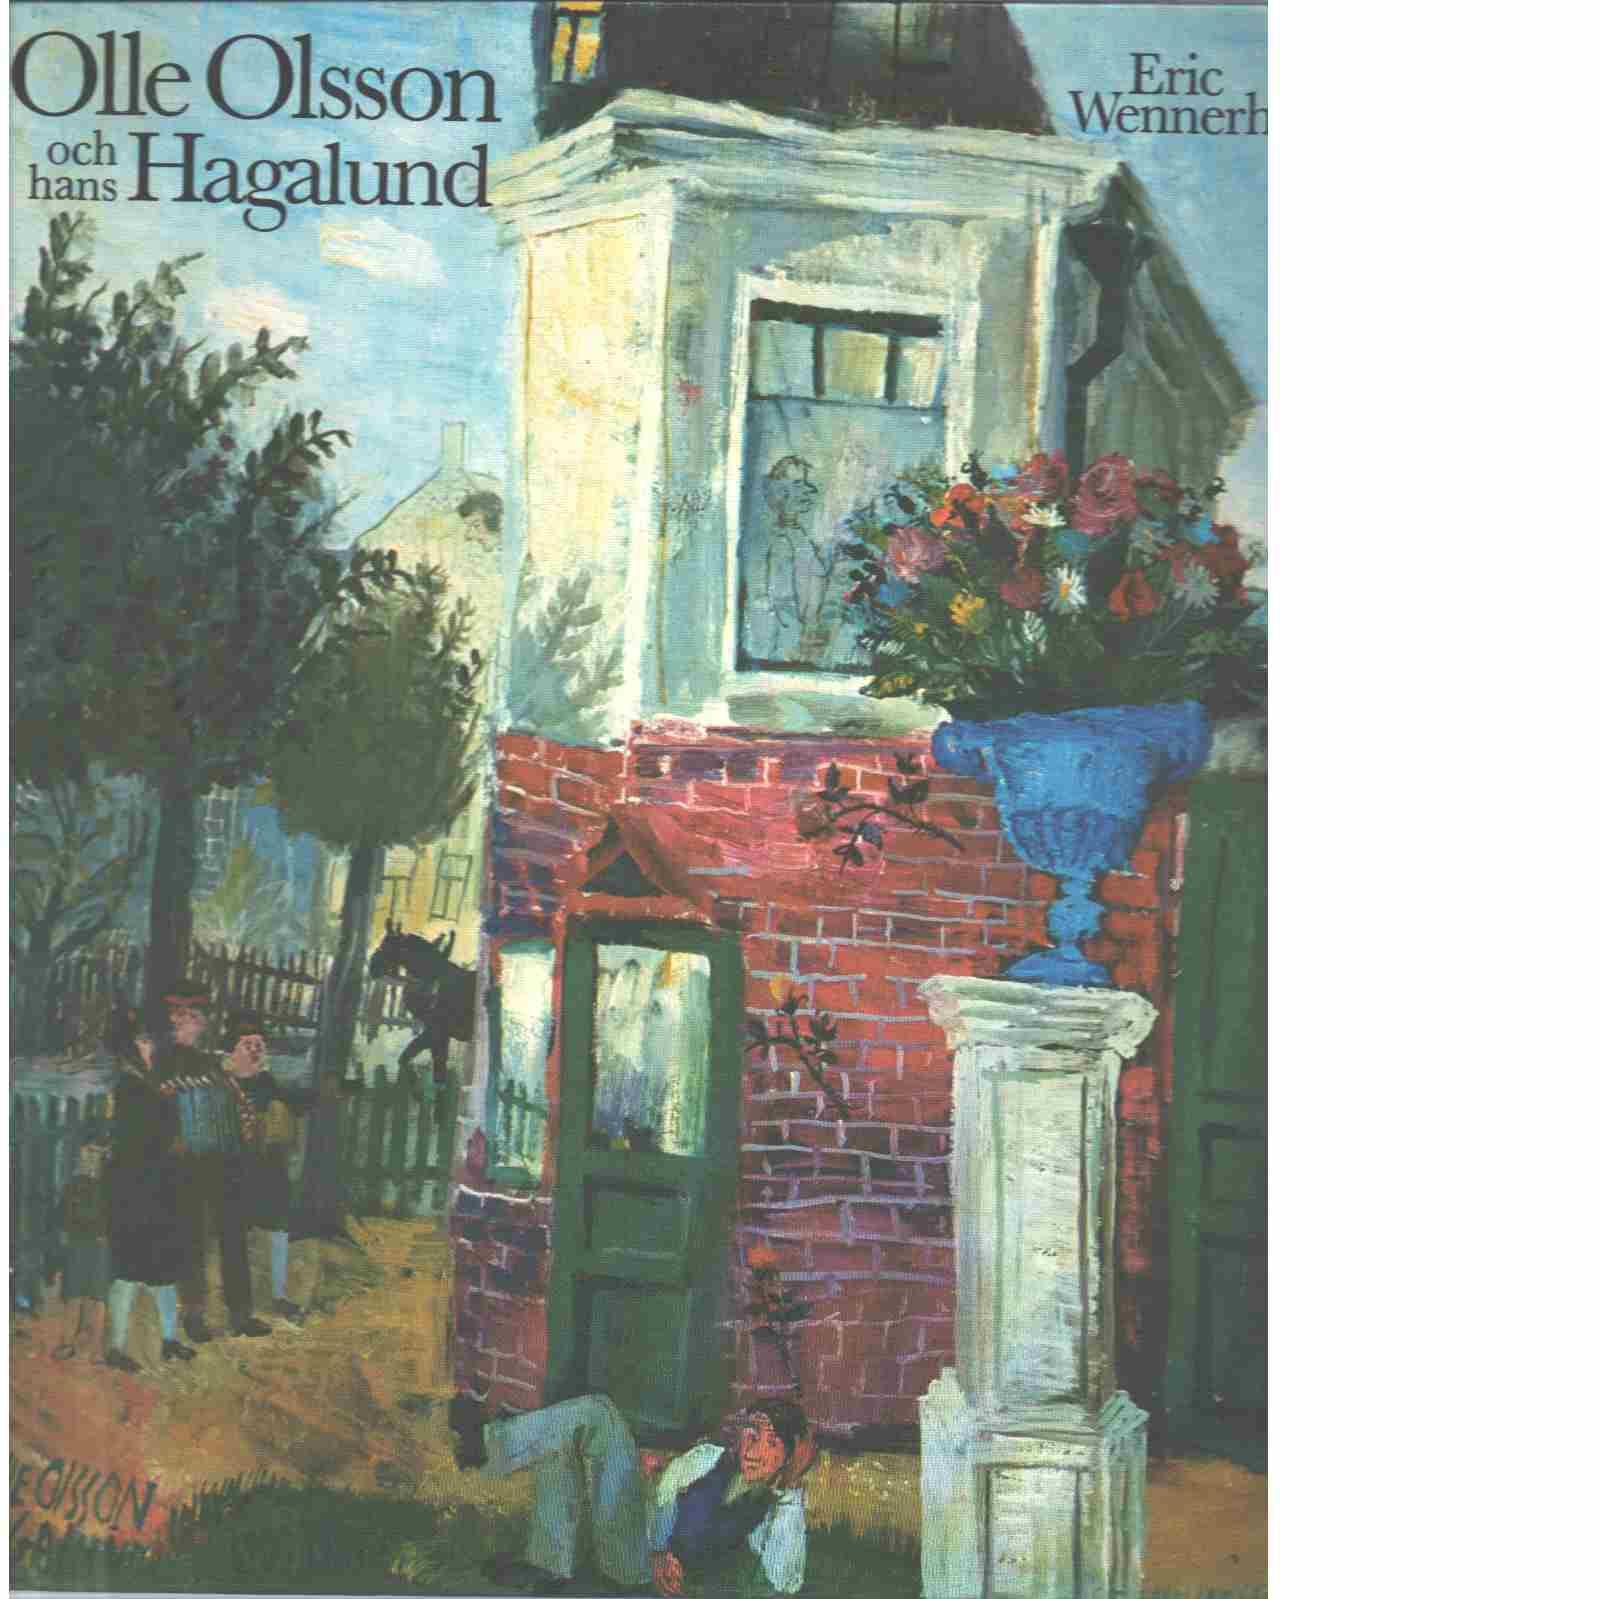 Olle Olsson och hans Hagalund - Wennerholm, Eric